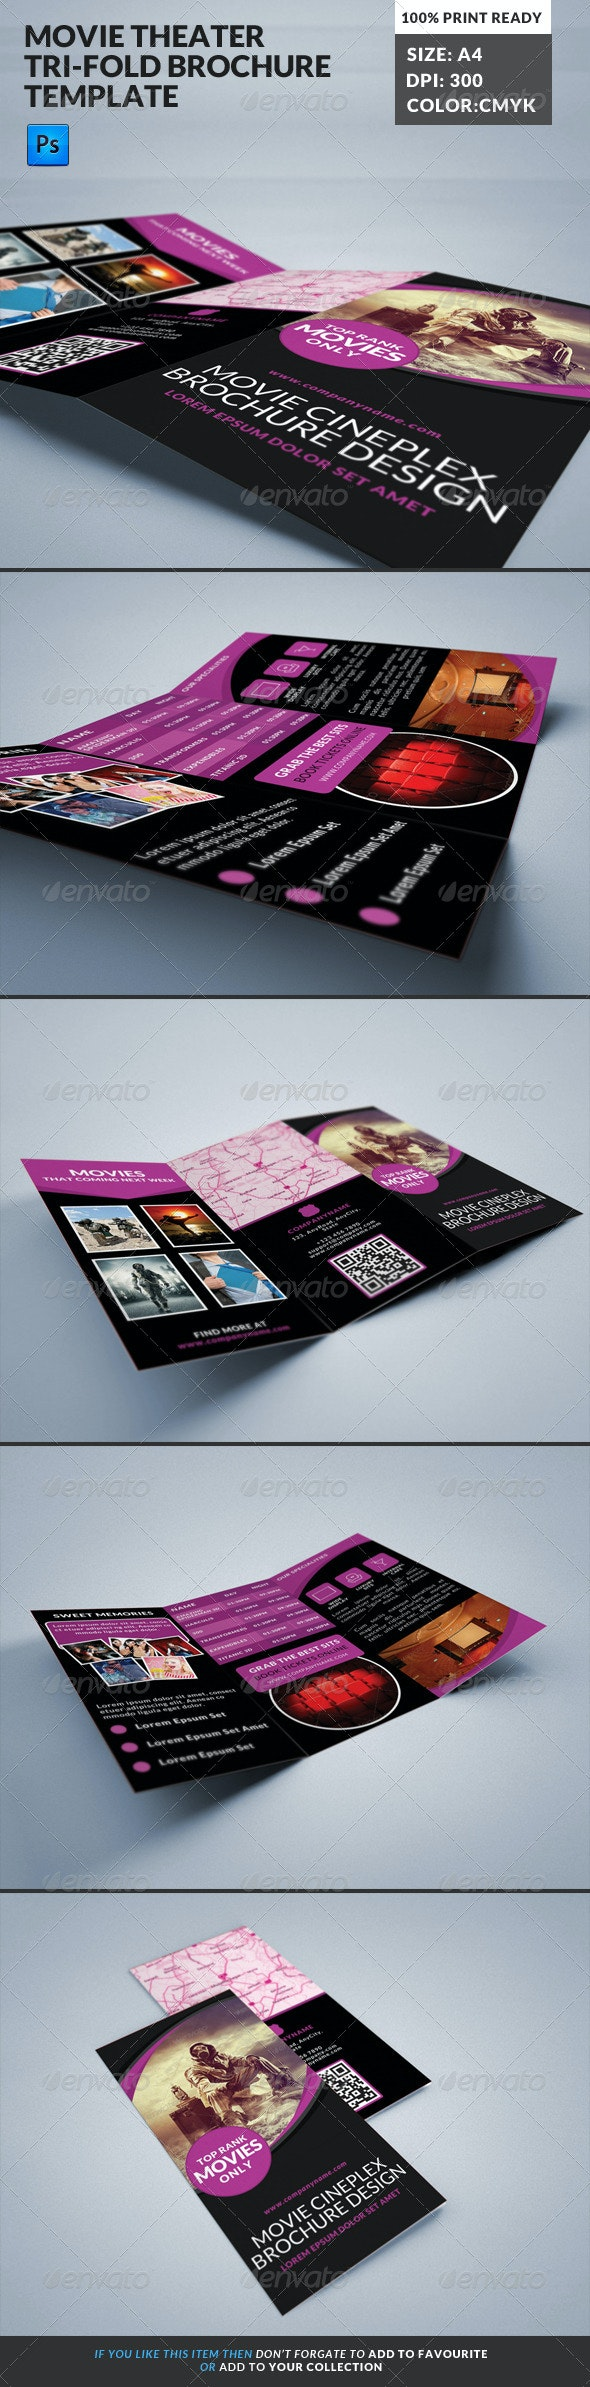 Movie Theater Cinema Hall Tri-Fold Brochure - Corporate Brochures